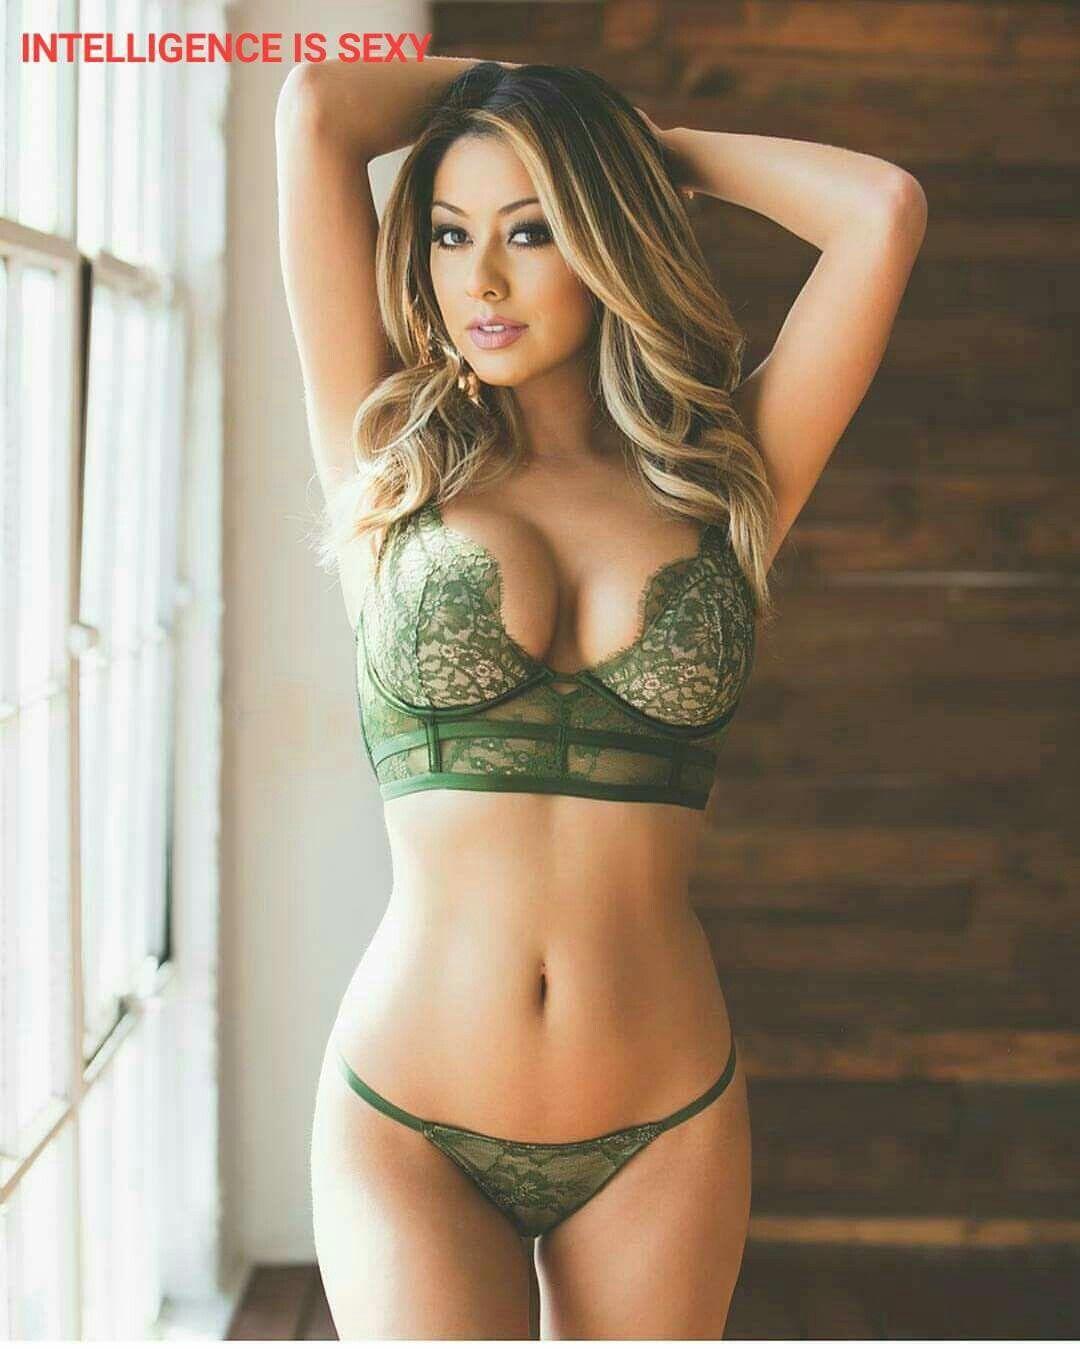 Sexy lingerie models explicit